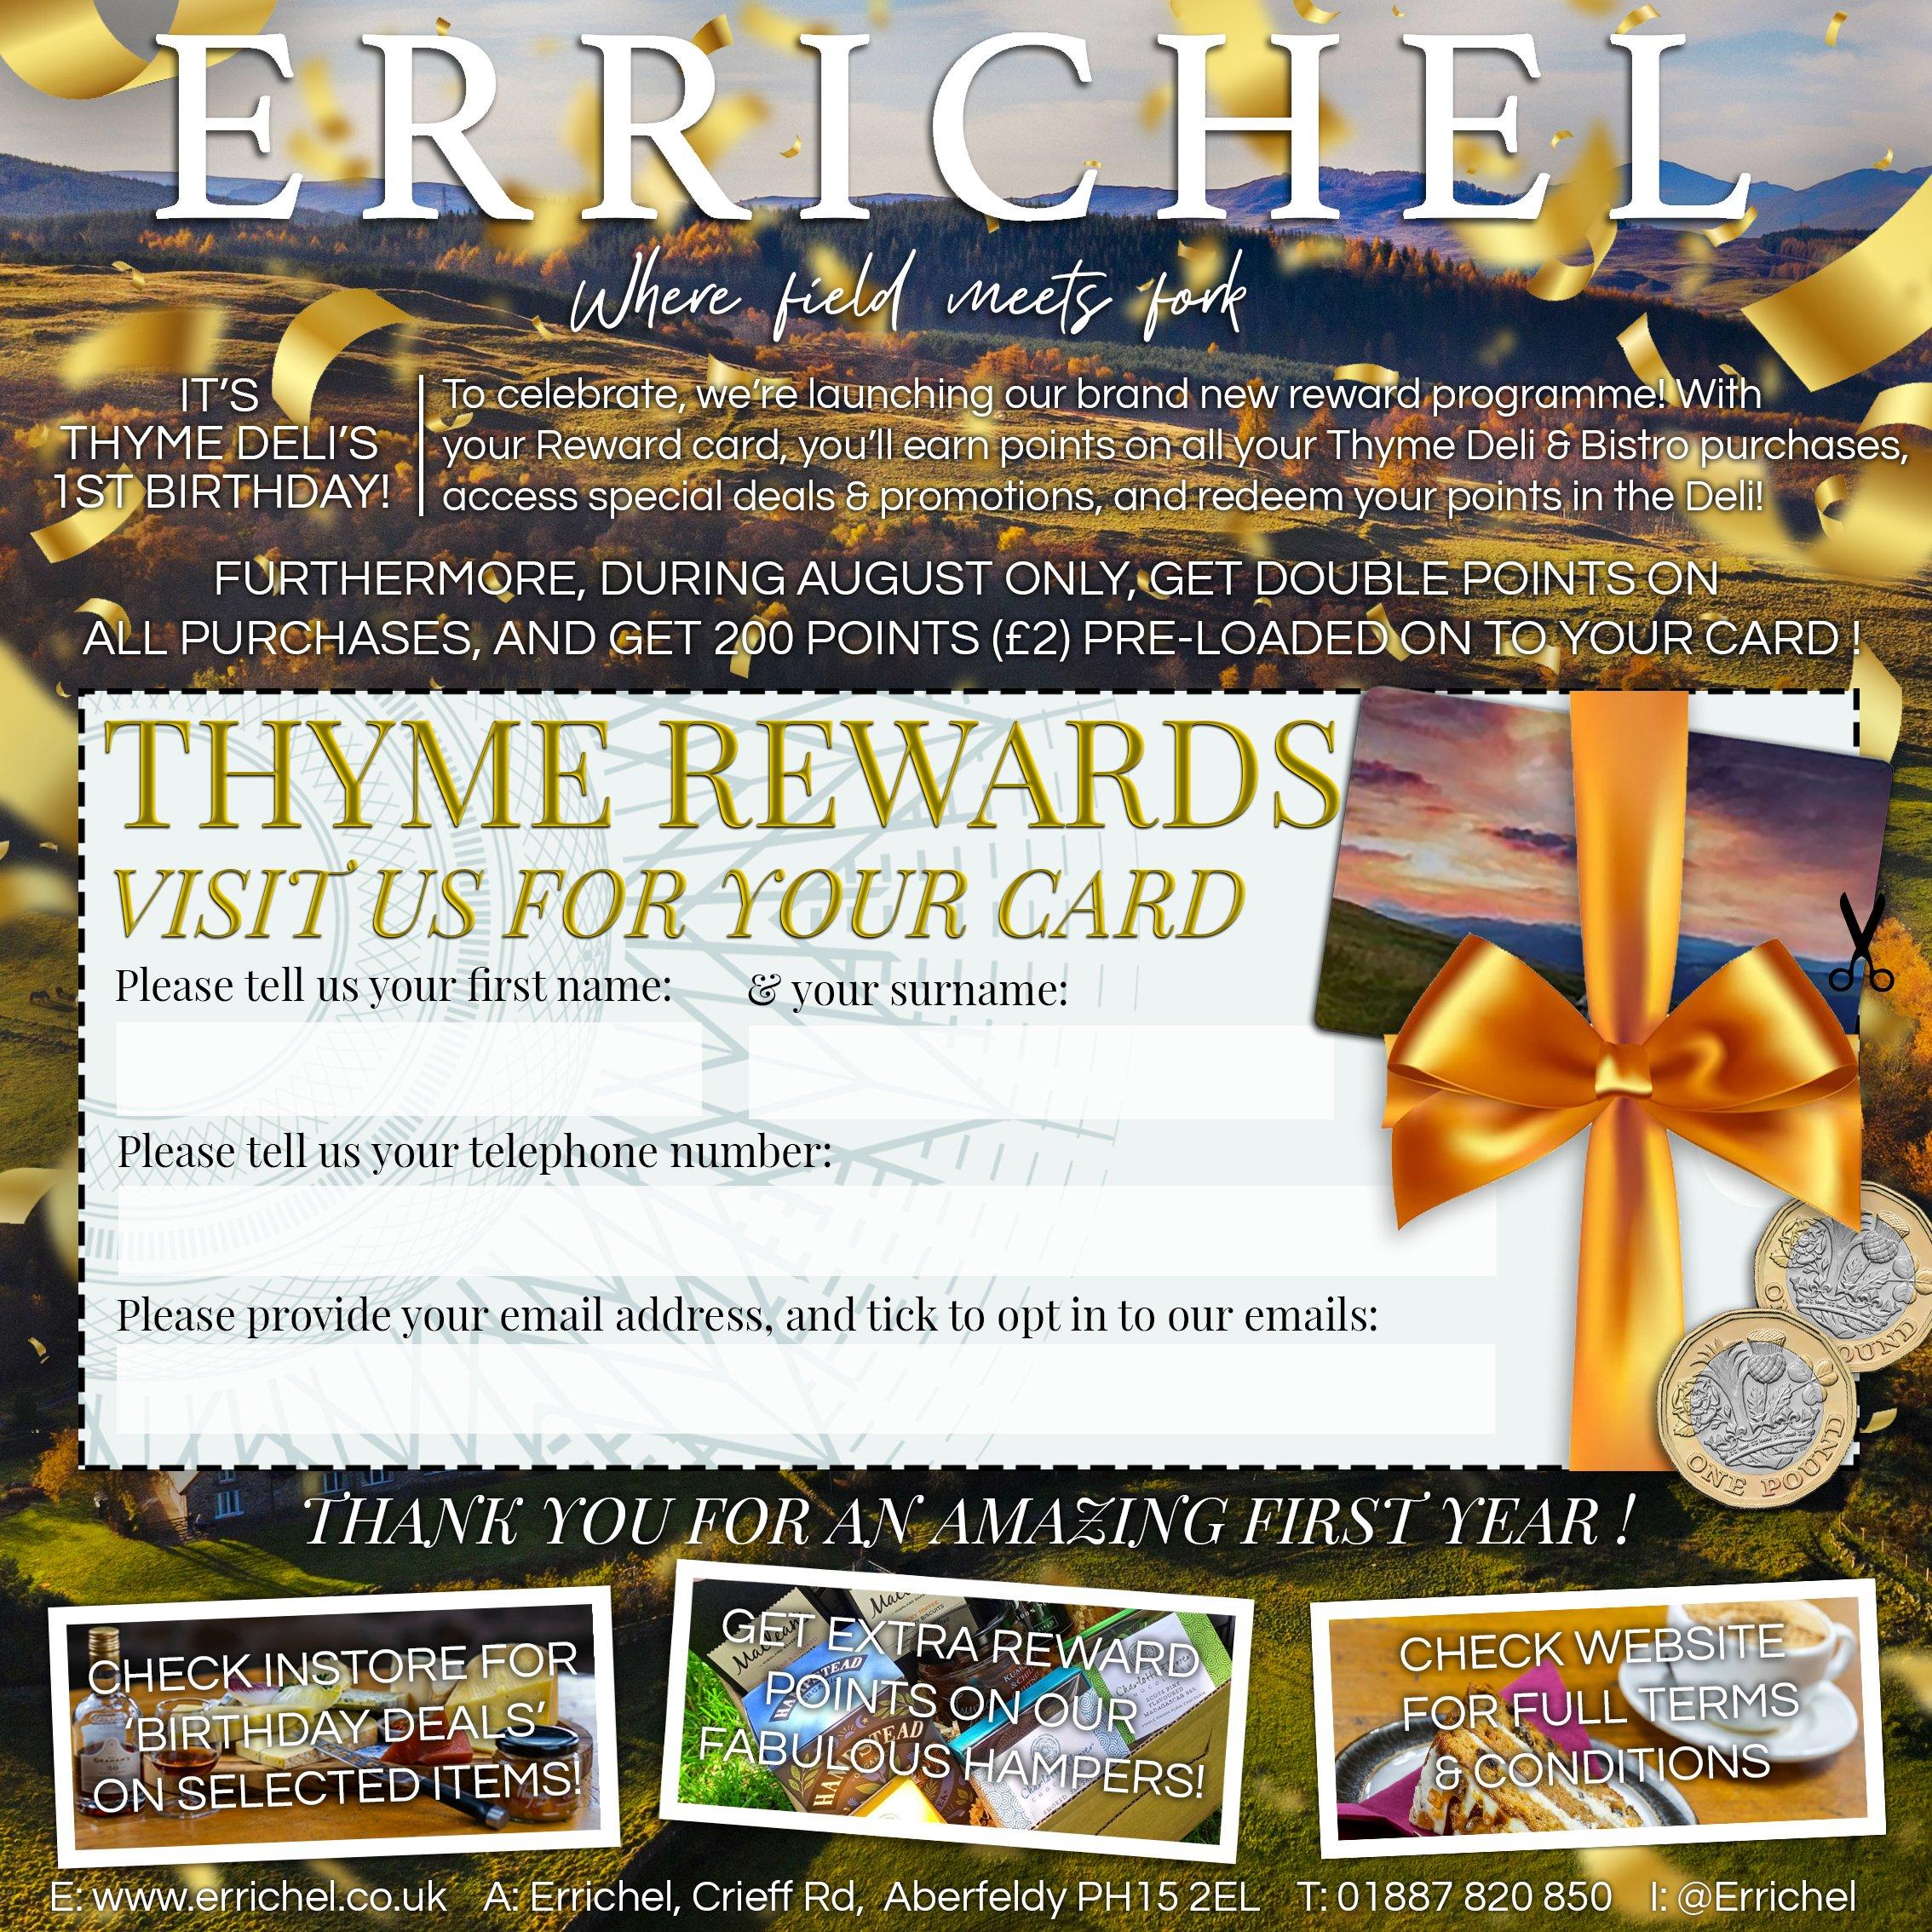 August 2021 Advertisement in the Quair - Thyme Reward loyalty programme at Errichel